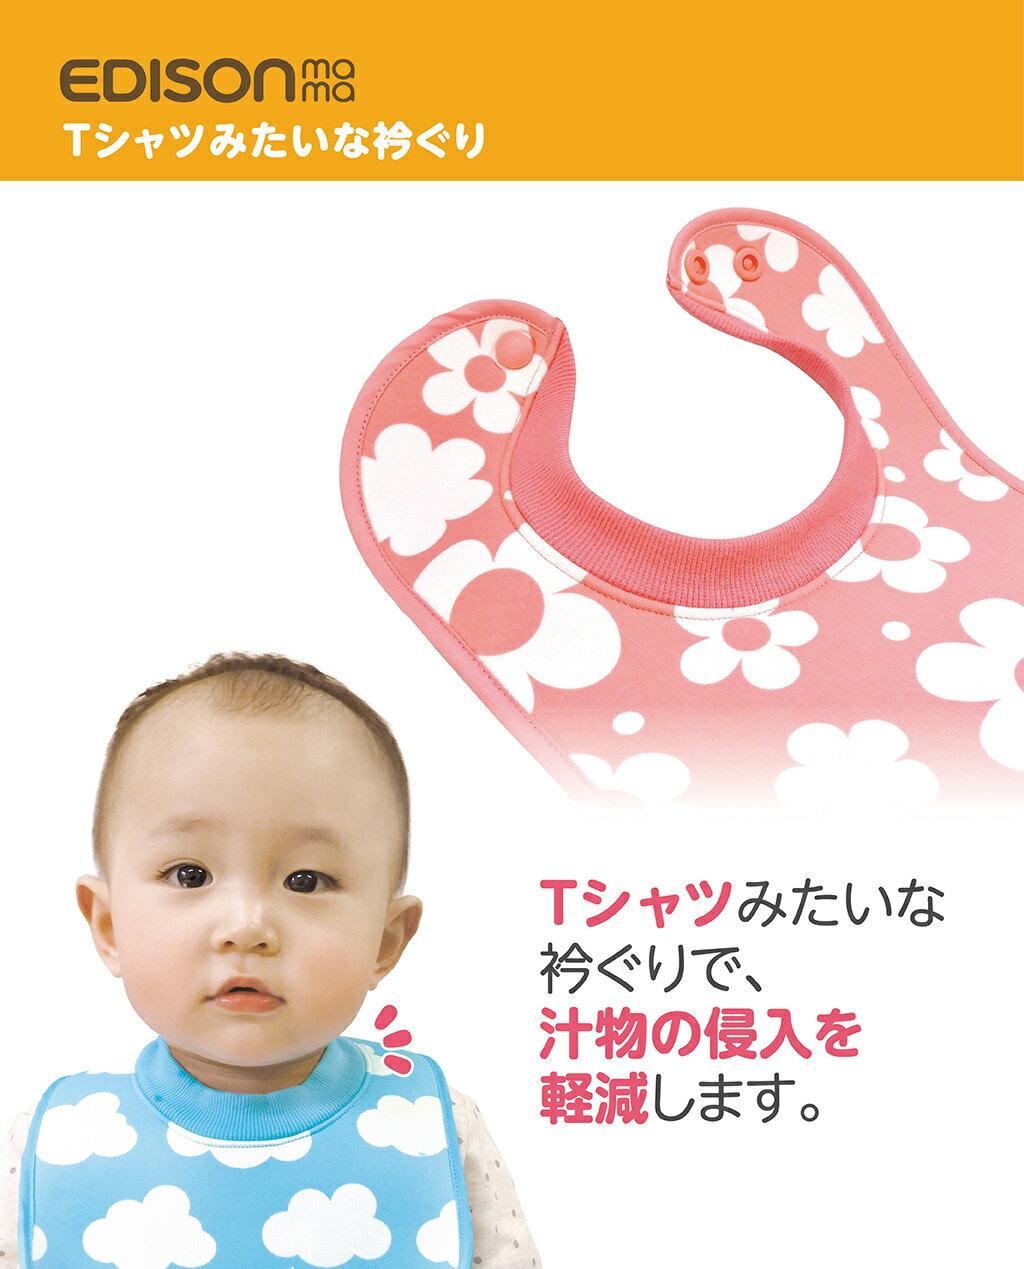 EDISON 5個月~2歲 嬰兒圍兜兜防屑防渣扣式捲收 粉花朵  藍白雲~JE 美妝~